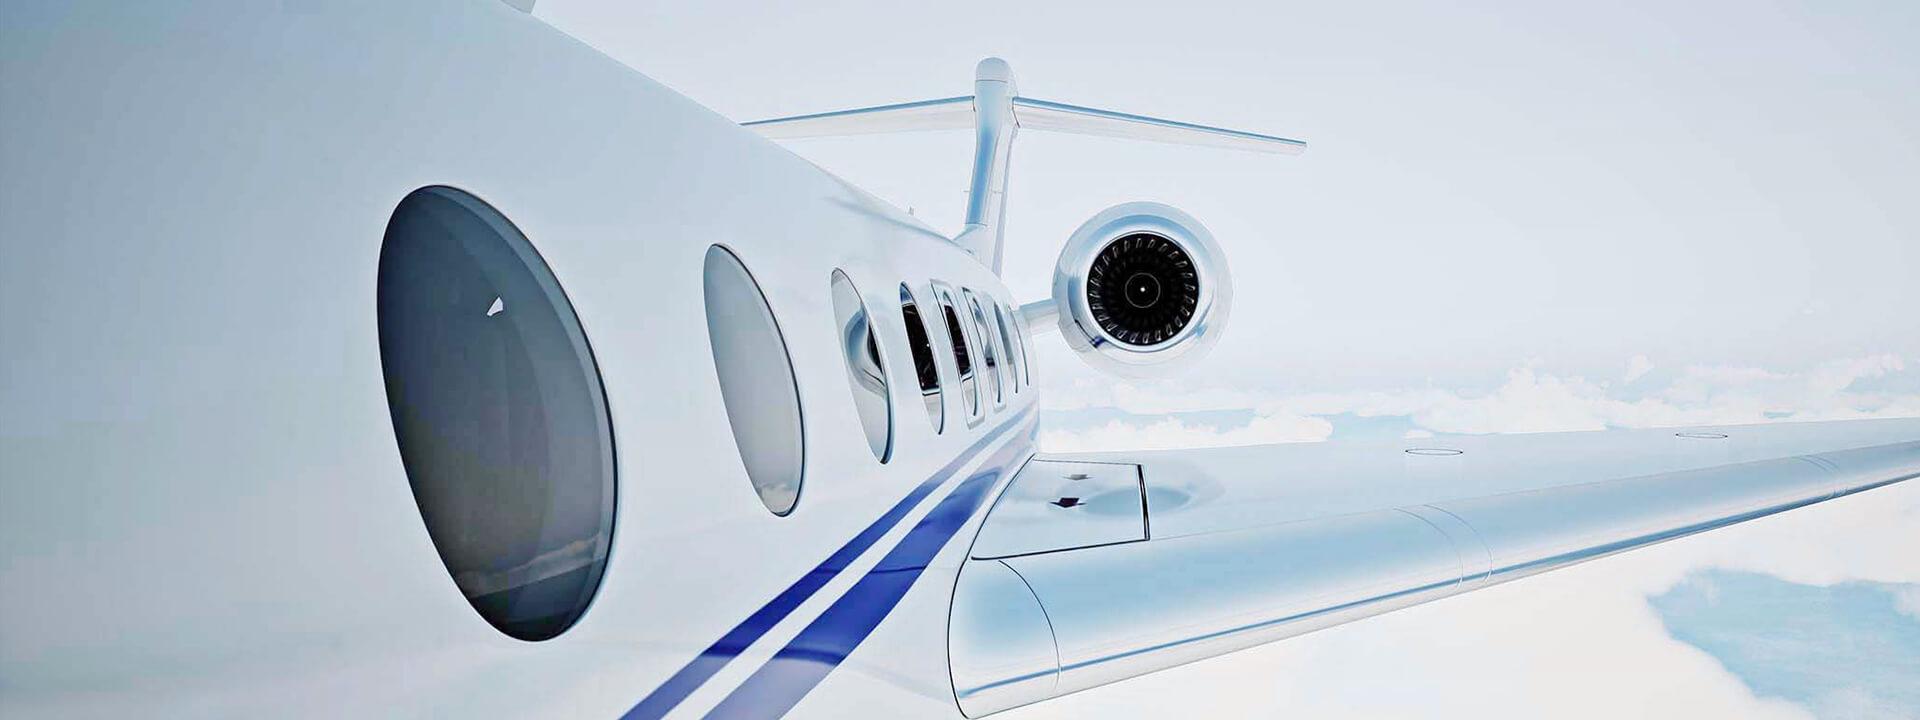 Jet Privato Listino Prezzi : Noleggio jet privato i prezzi app